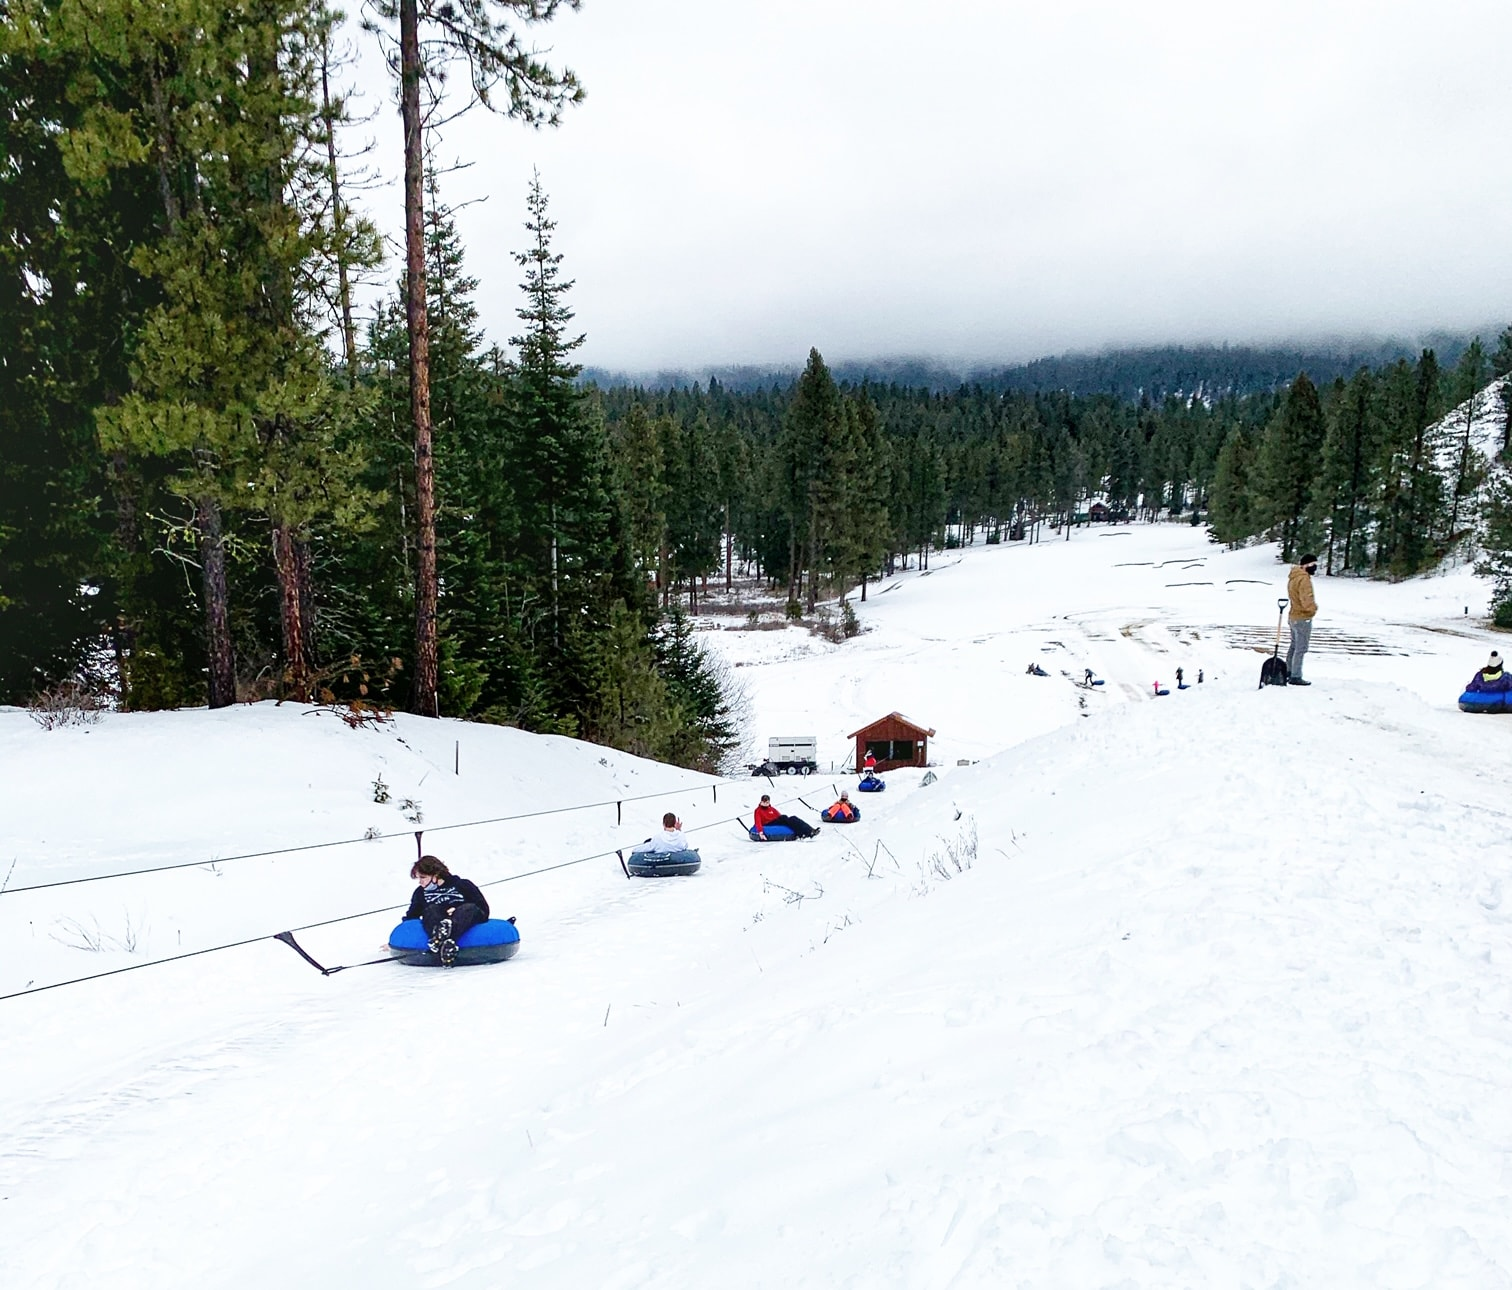 Snow Tubing at Suncadia